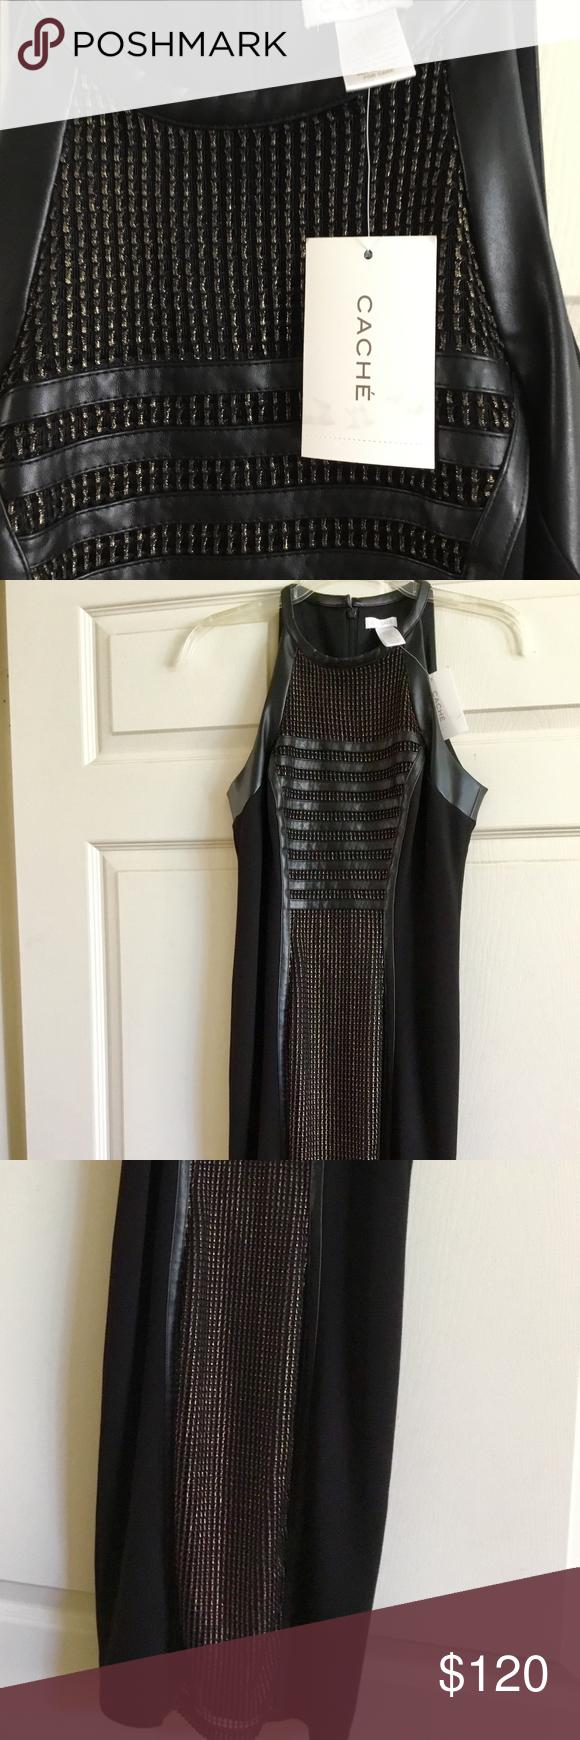 Cache blackgold dress wmesh sz nwt party nwt my posh closet